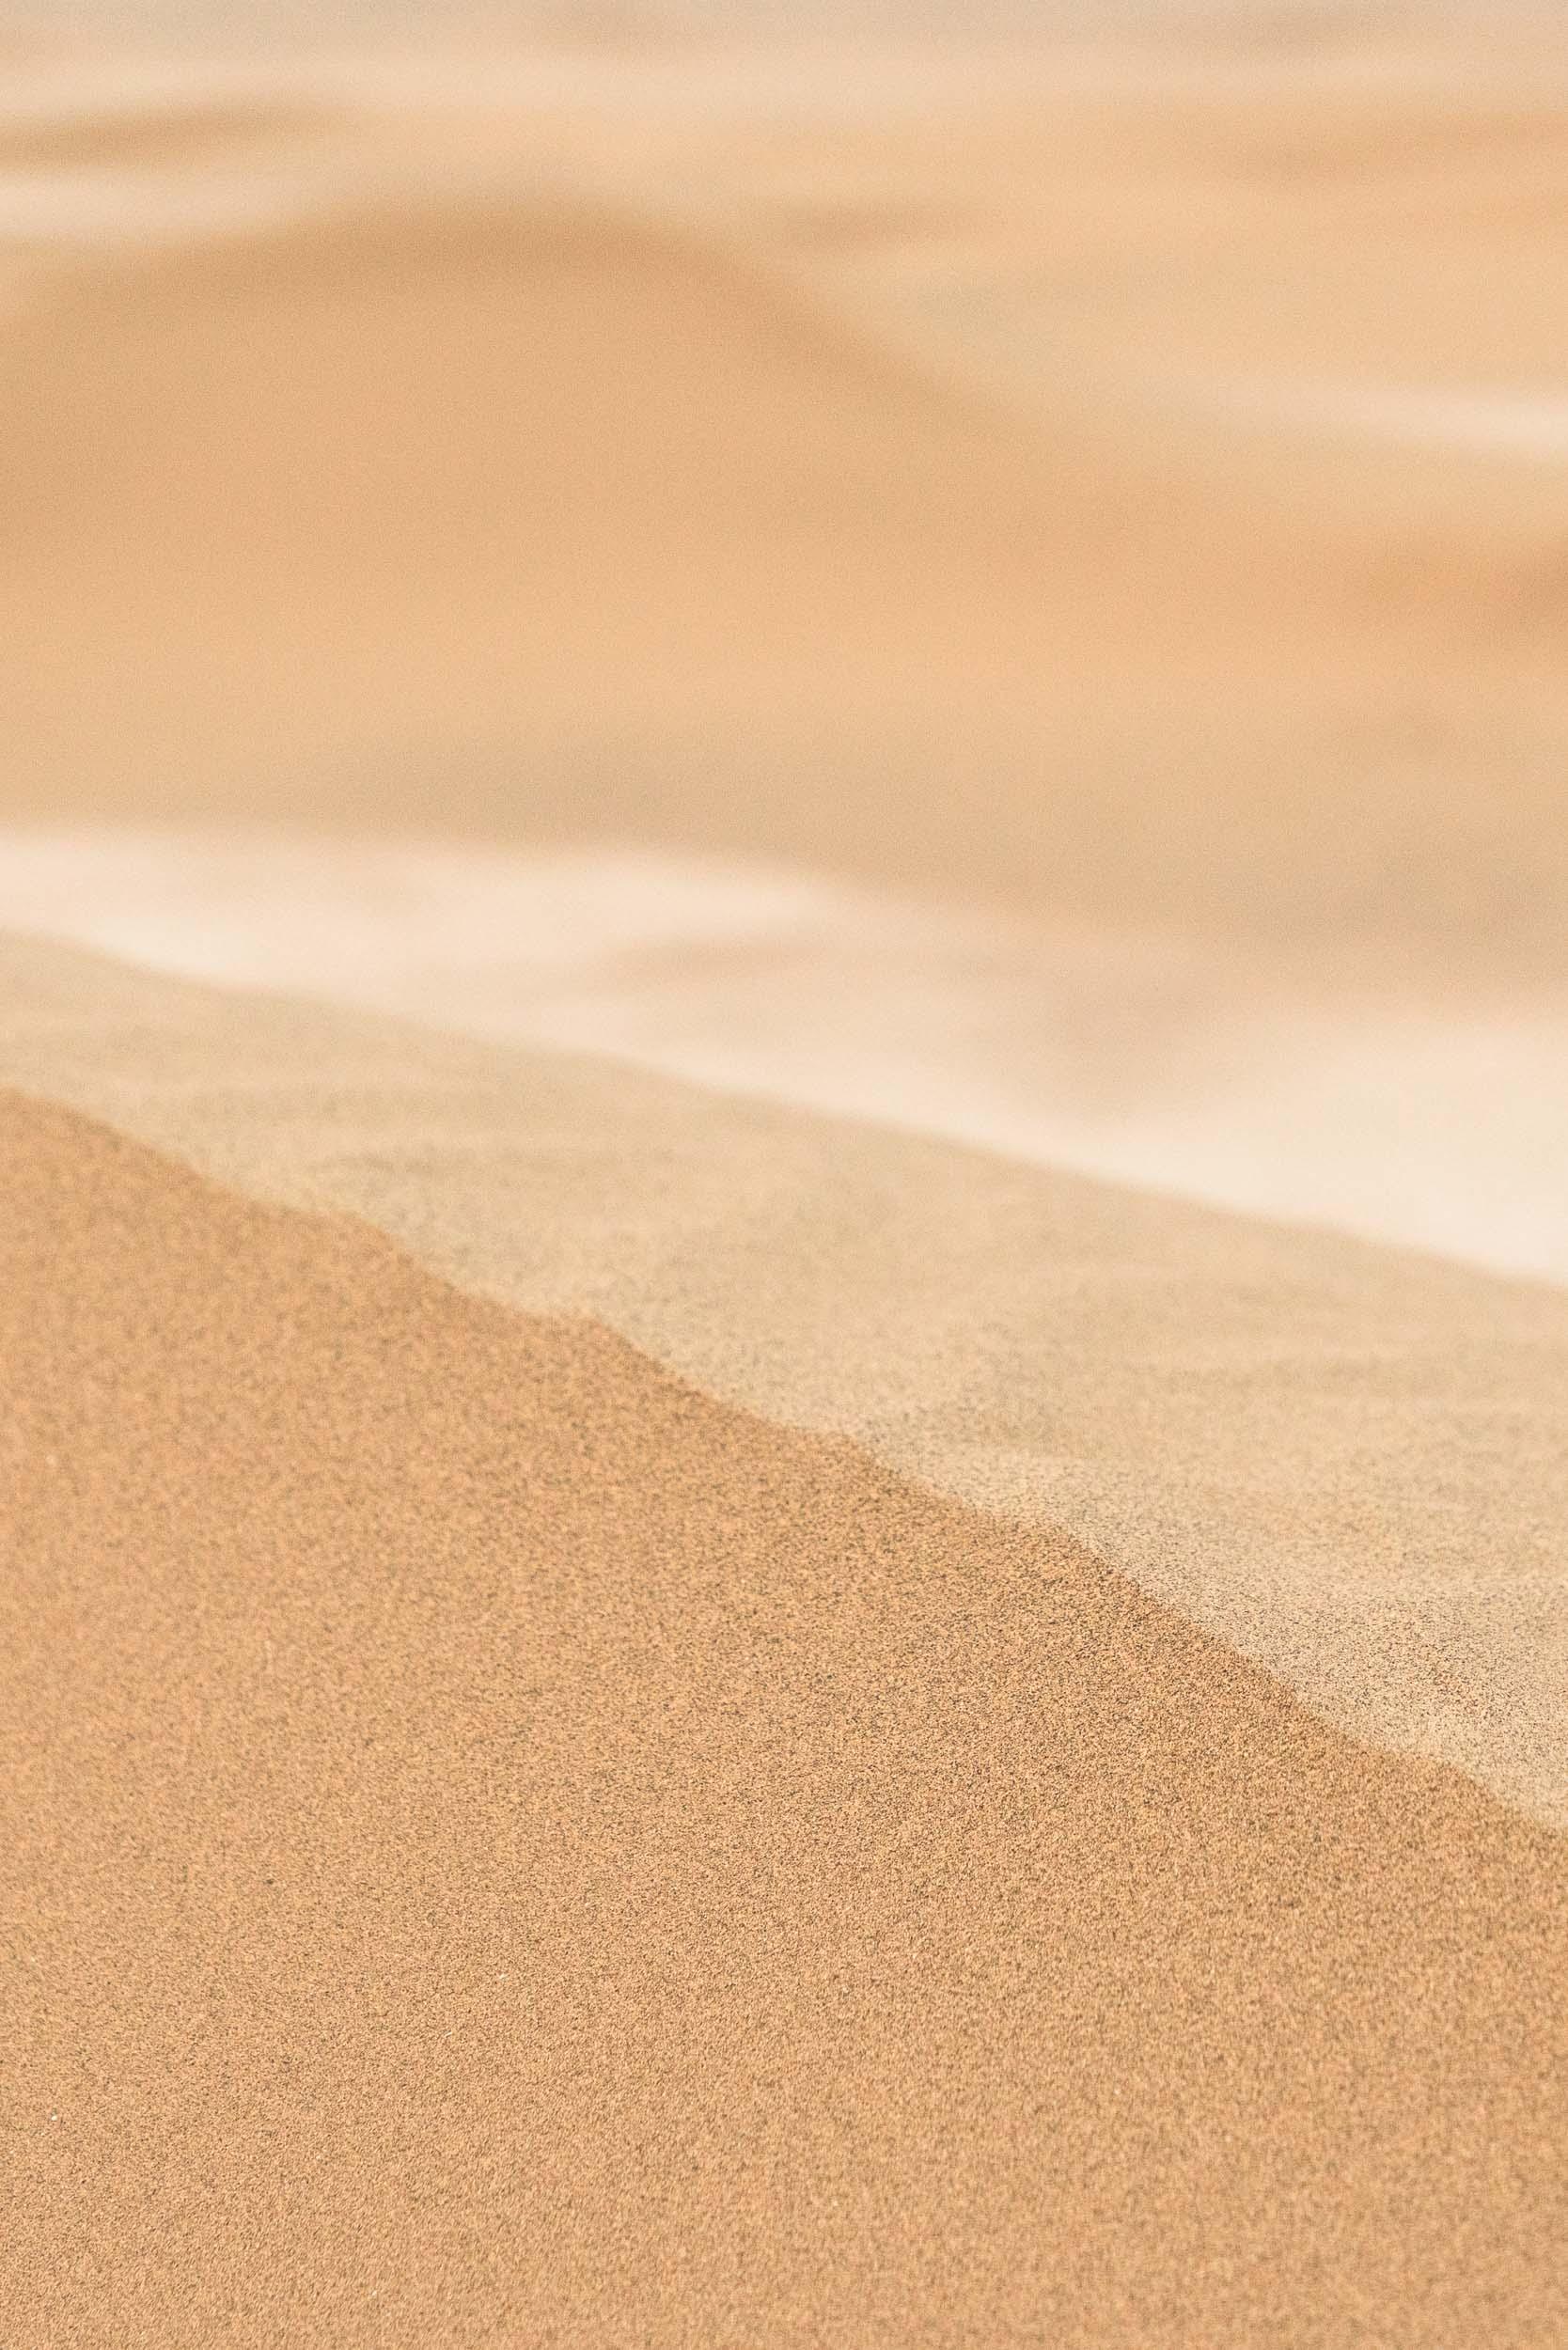 the_getaway_edit_morocco_dar_ahlam_sahara_desert-29.jpg